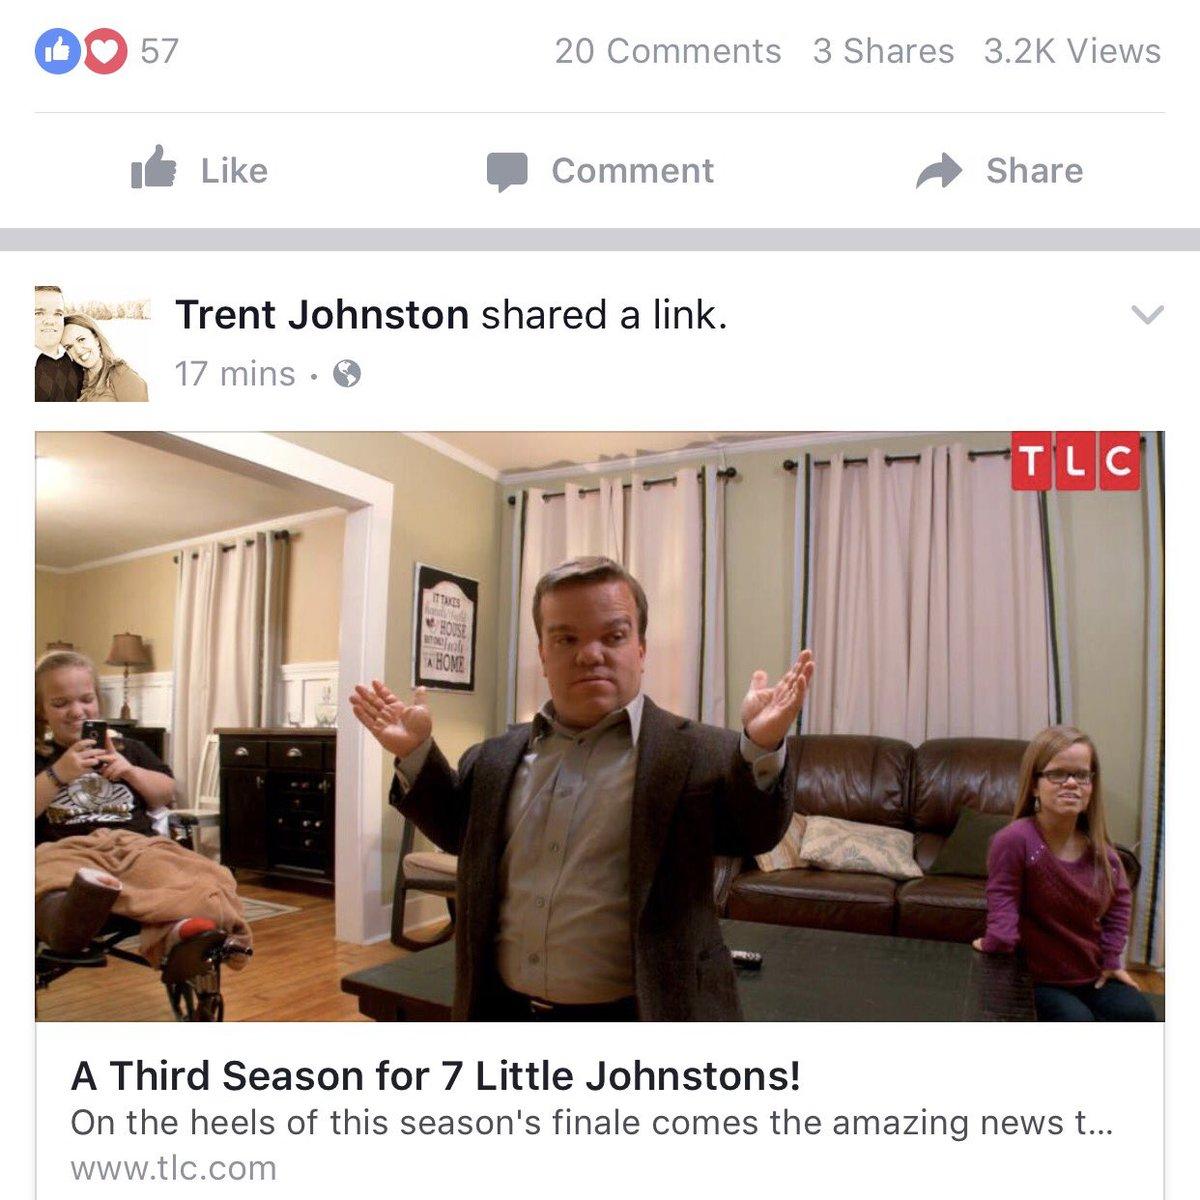 #7LittleJohnstons Season  Finale tonight...but no worries, Season 3 will be here soon!! #team7lj #newadventures <br>http://pic.twitter.com/gBaVRQIgeK